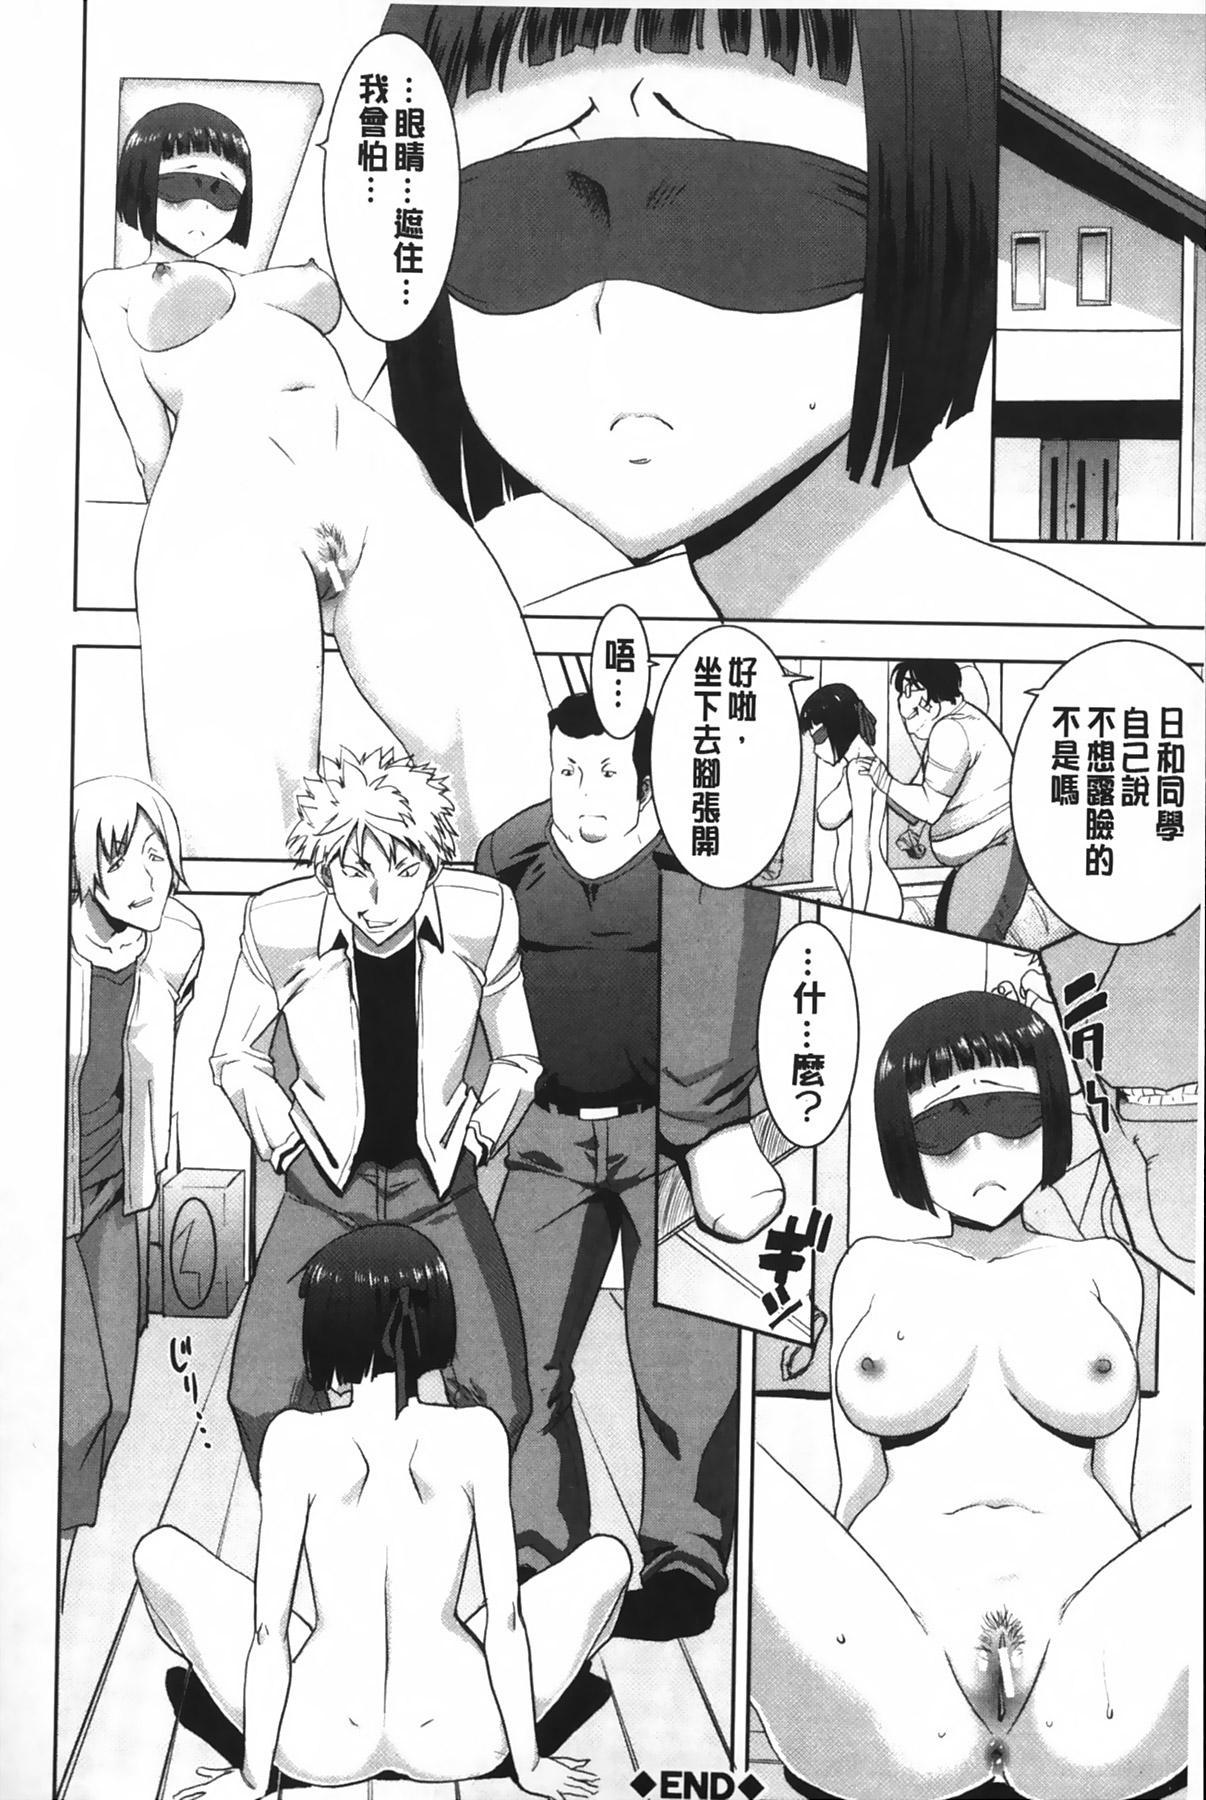 Ane Unsweet - Mihiragi Hiyori + | 姊姊不甜美 彌平木日和+ 46